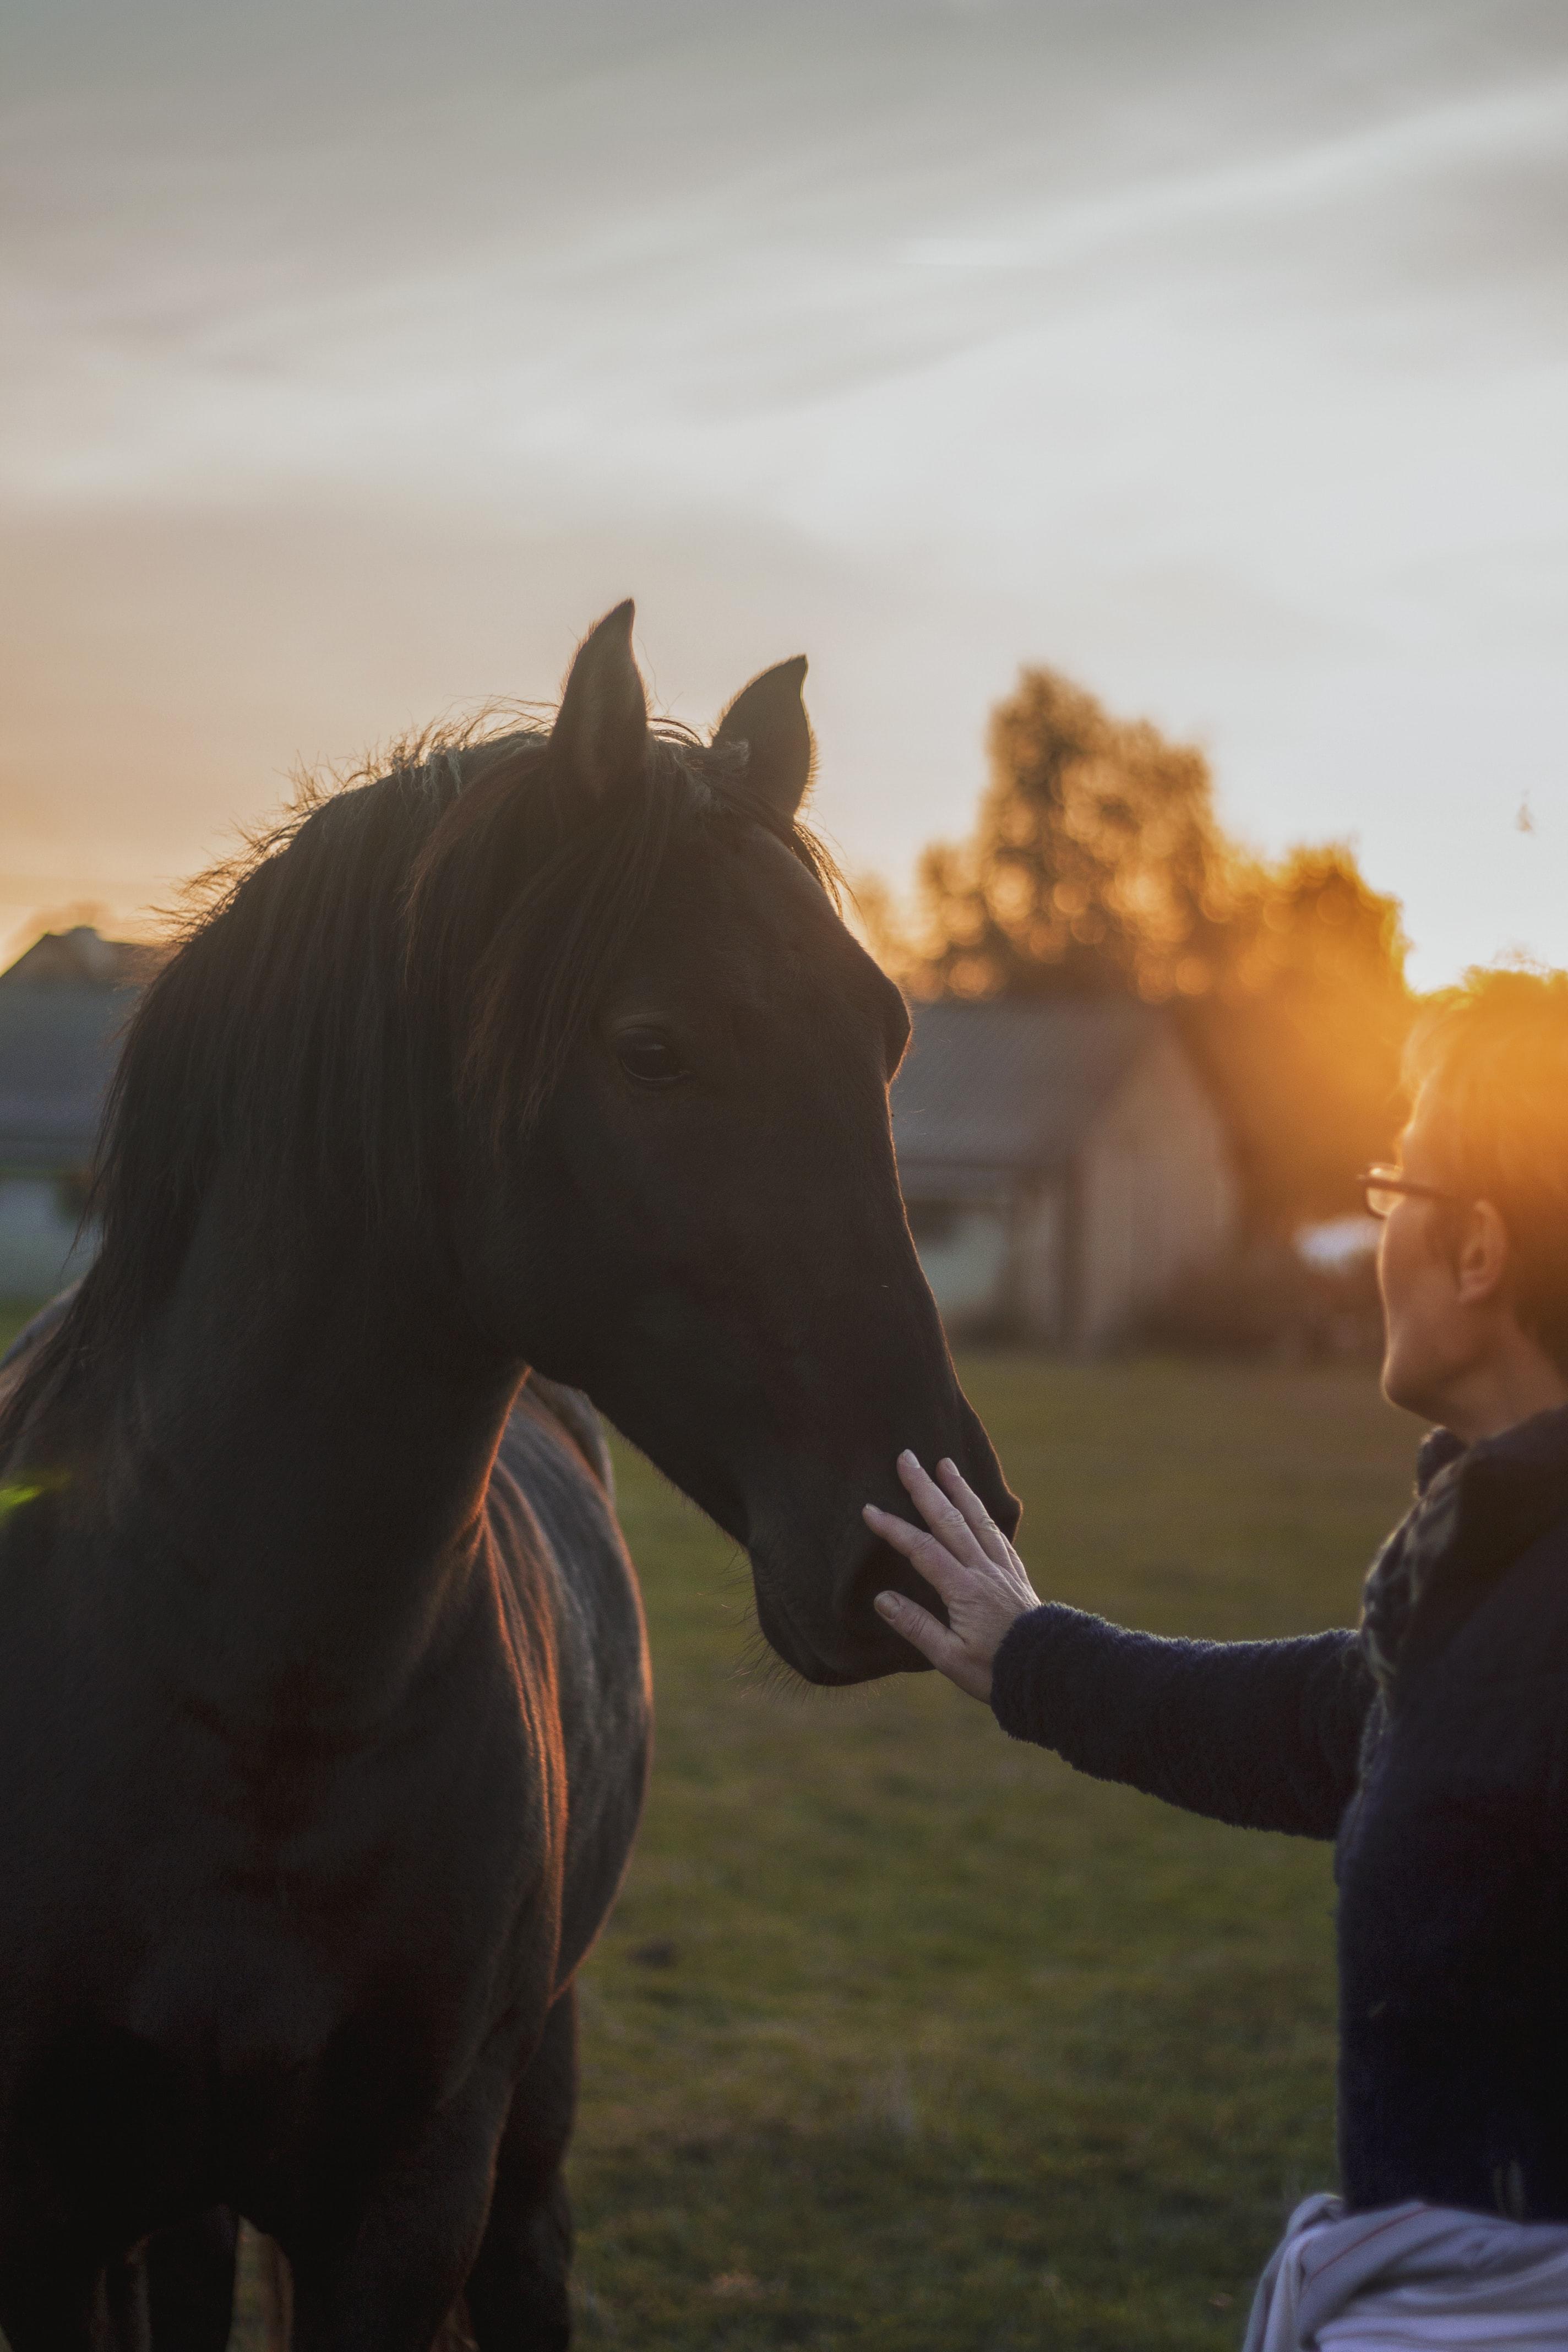 500 Black Horse Pictures Hd Download Free Images On Unsplash